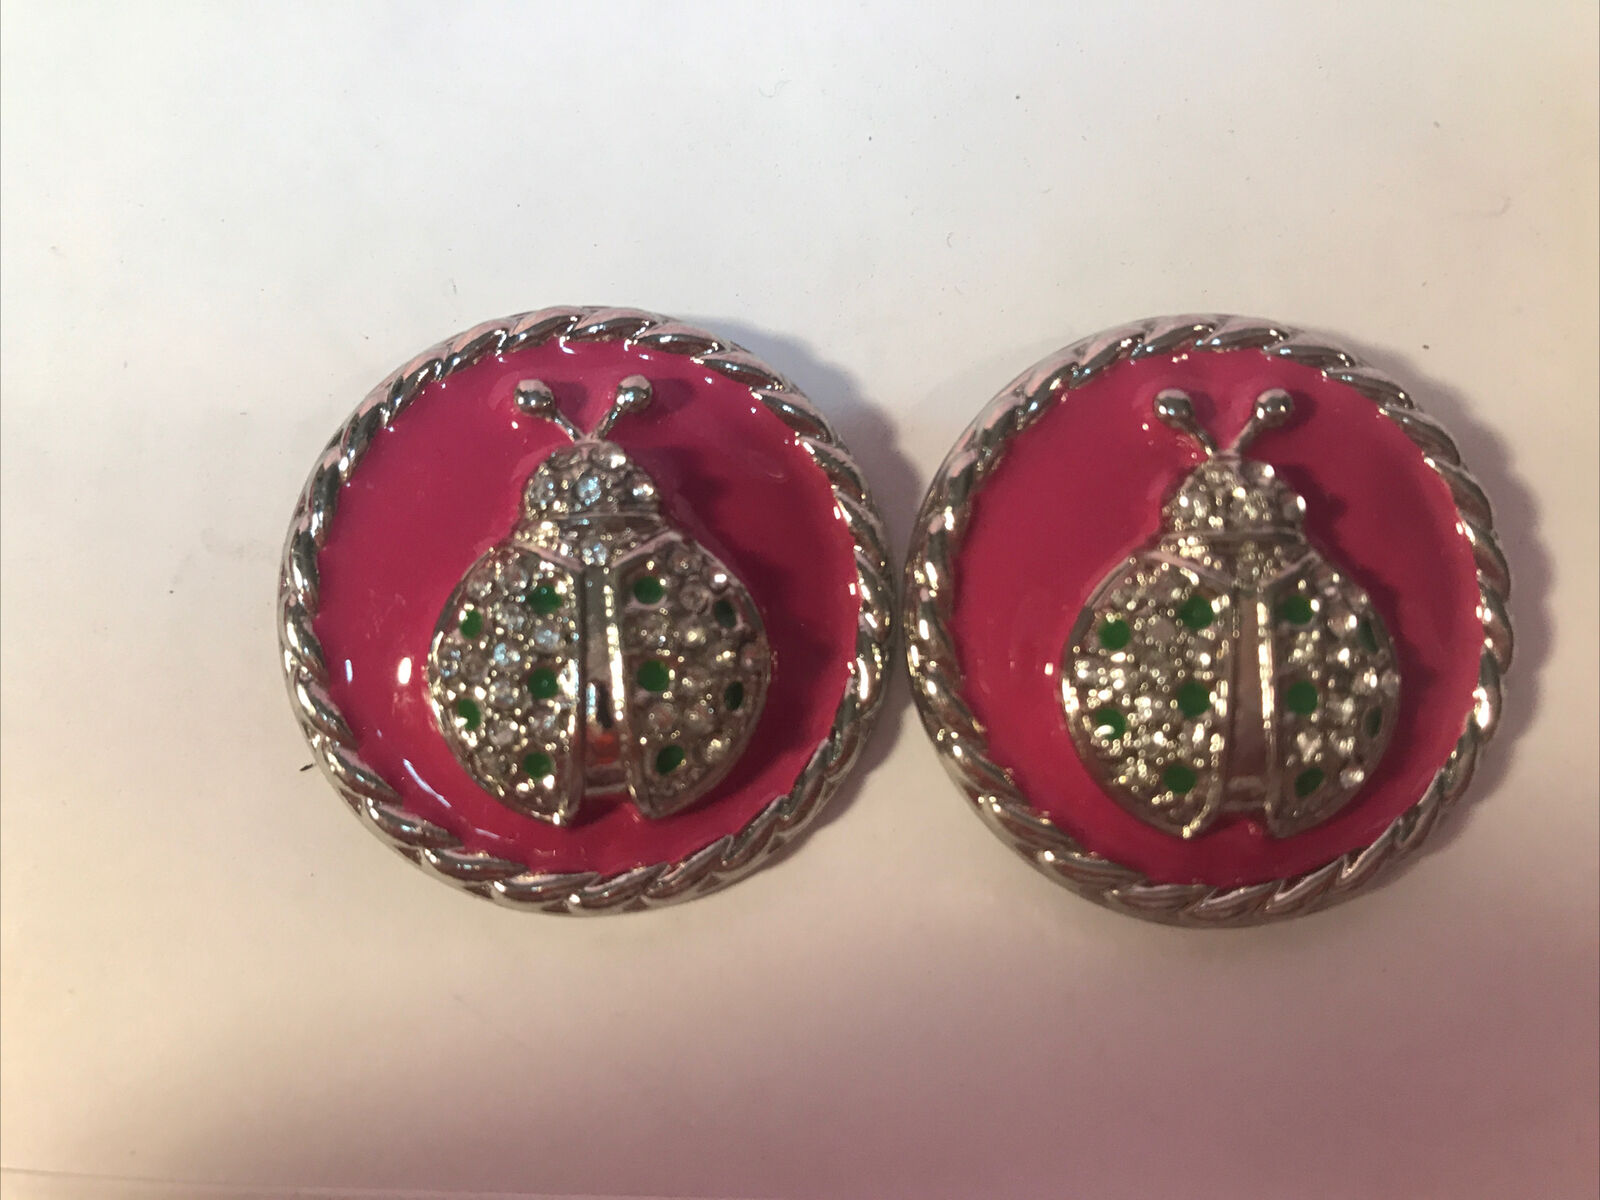 Lindsay Philips Interchangeable Shoe Snaps Decorative Charms PINK/SILVER LADYBUG